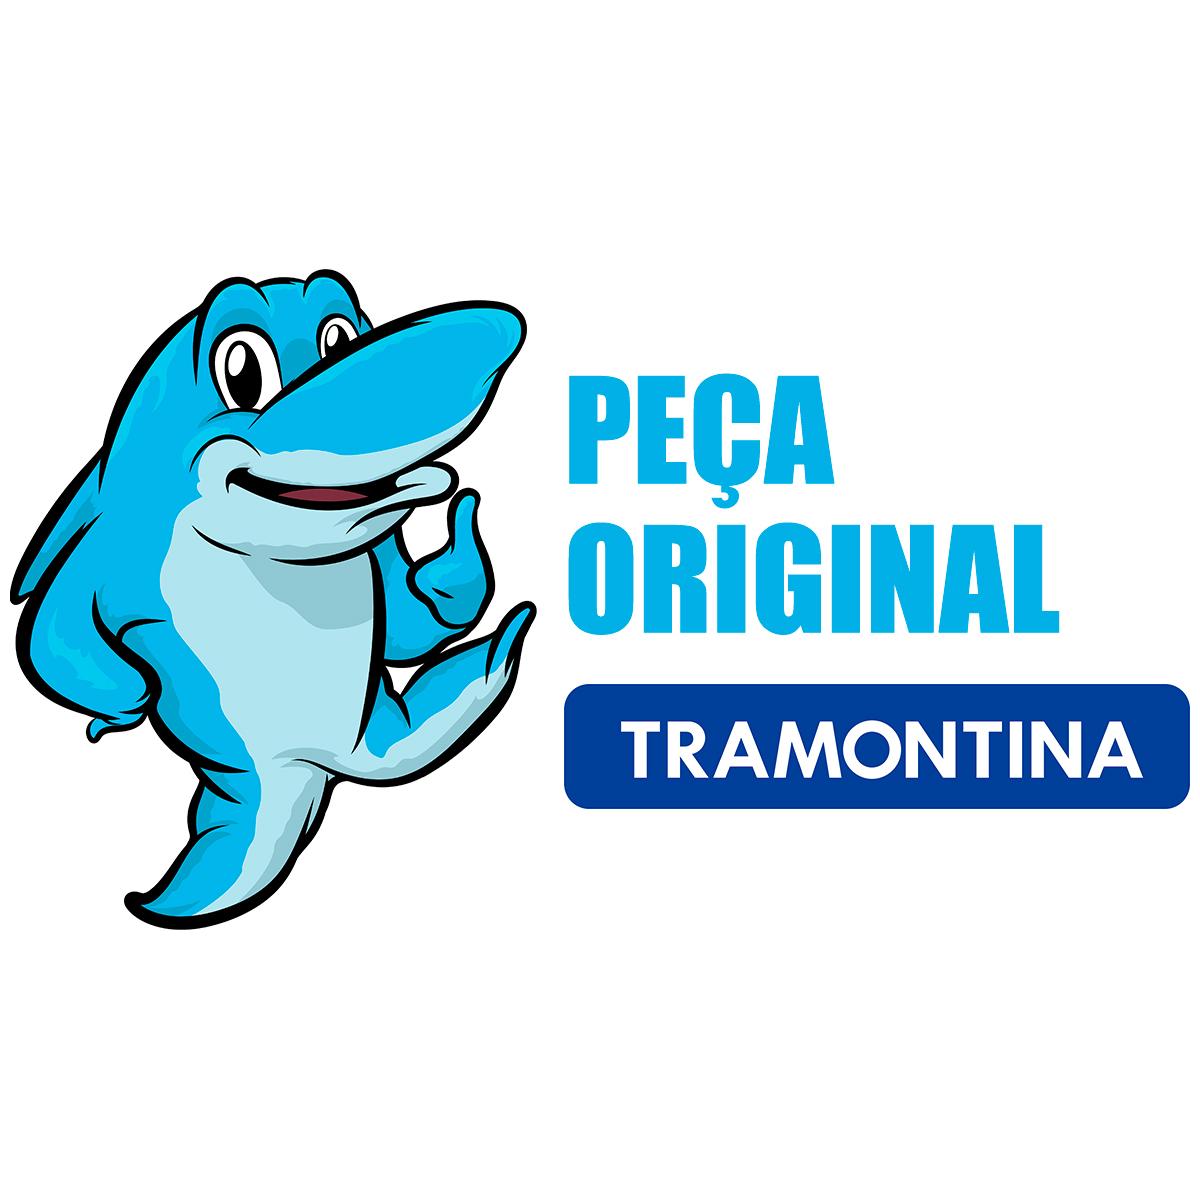 Kit Válvulas de entrada para Lavadora Tramontina 1500psi 1200w, 1600psi 1400w e 1900psi 1800w Original 03pcs